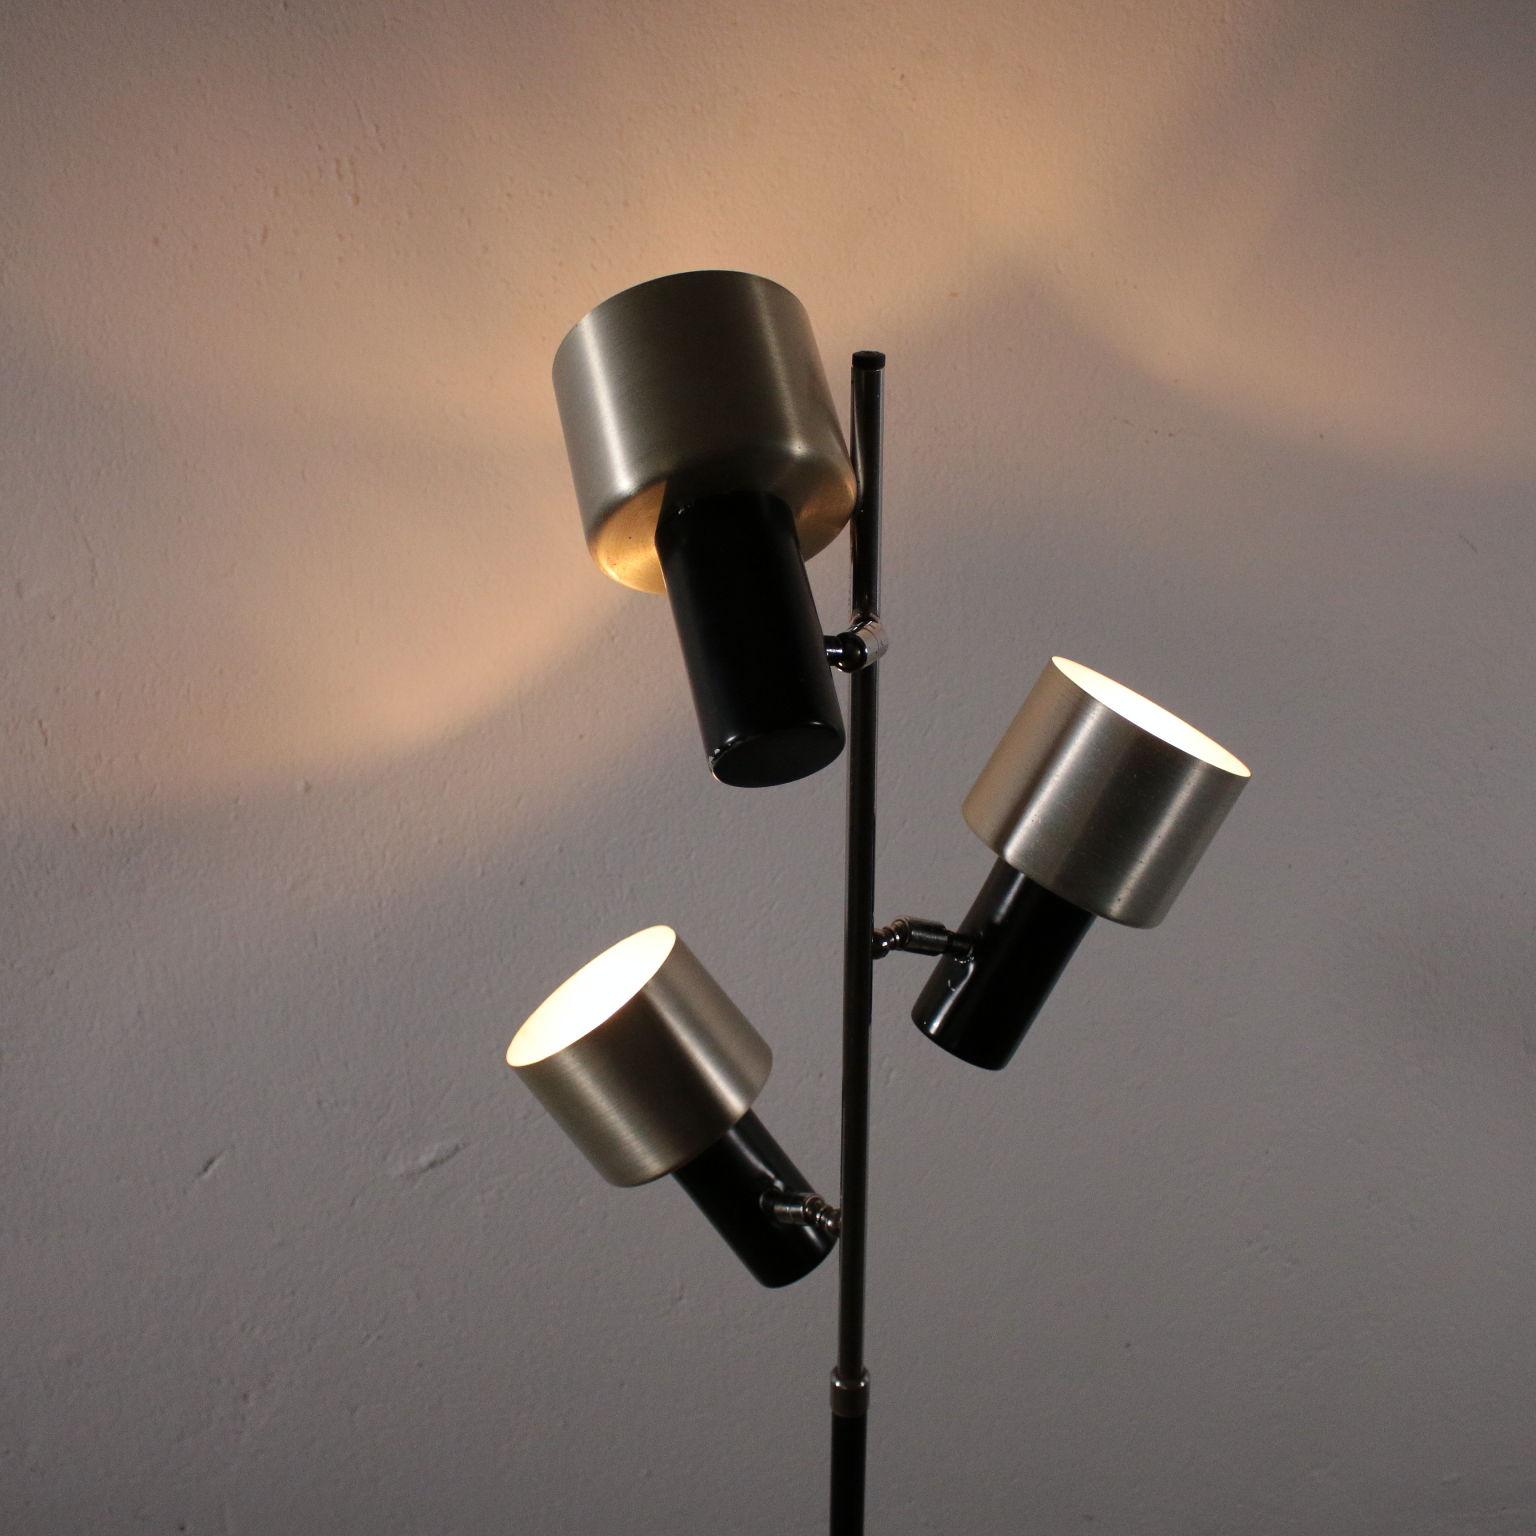 Stehlampe Aluminium Metall Marmor Vintage Italien 60er 70er Jahre